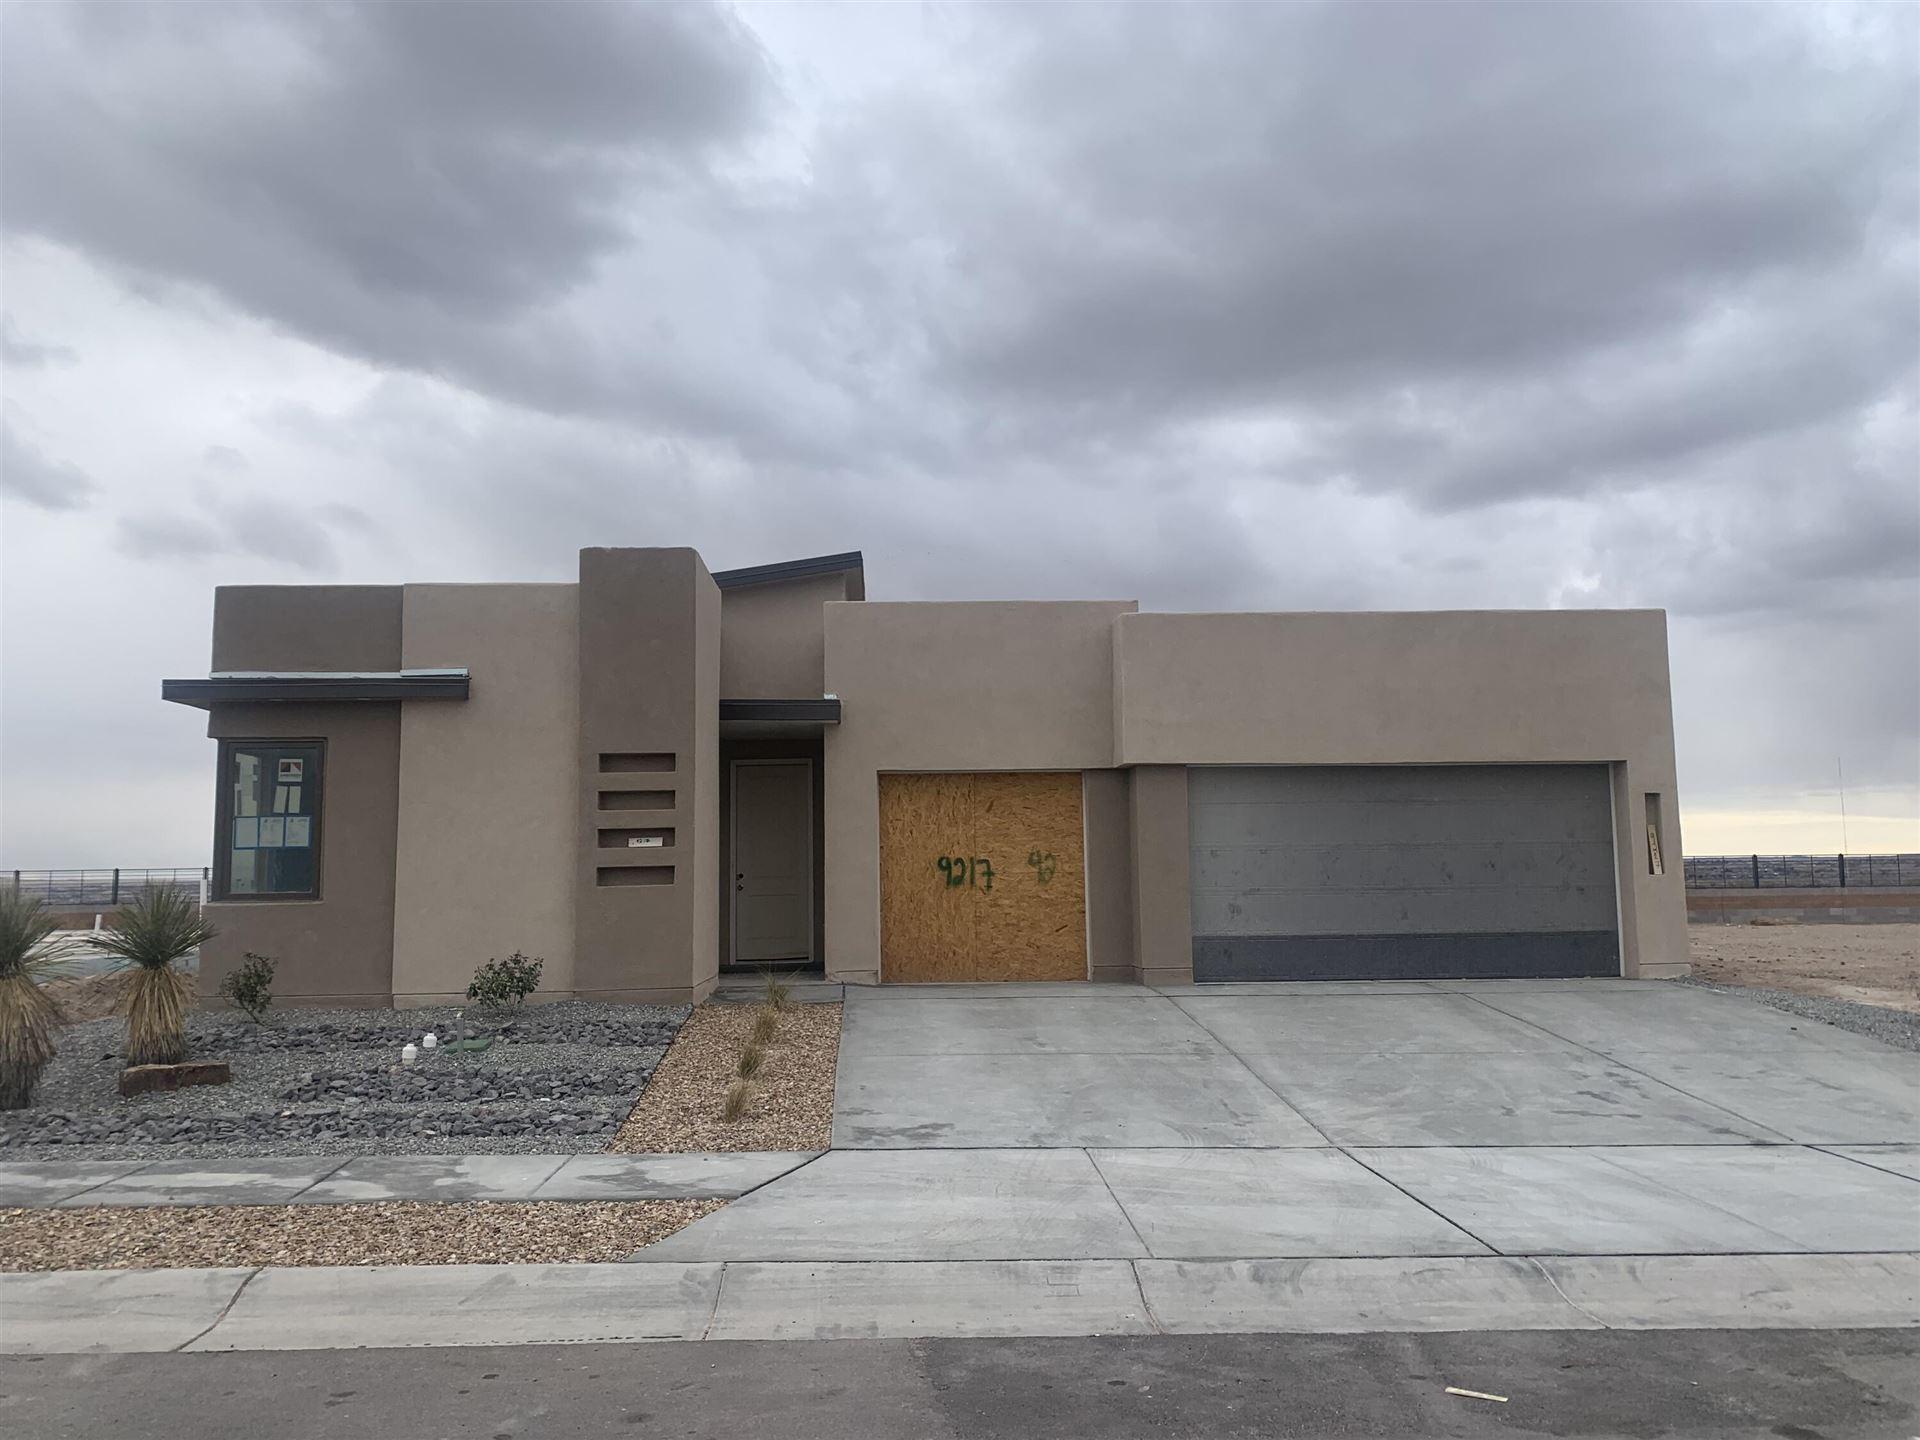 9217 Balloon Glow NE, Albuquerque, NM 87113 - MLS#: 999971